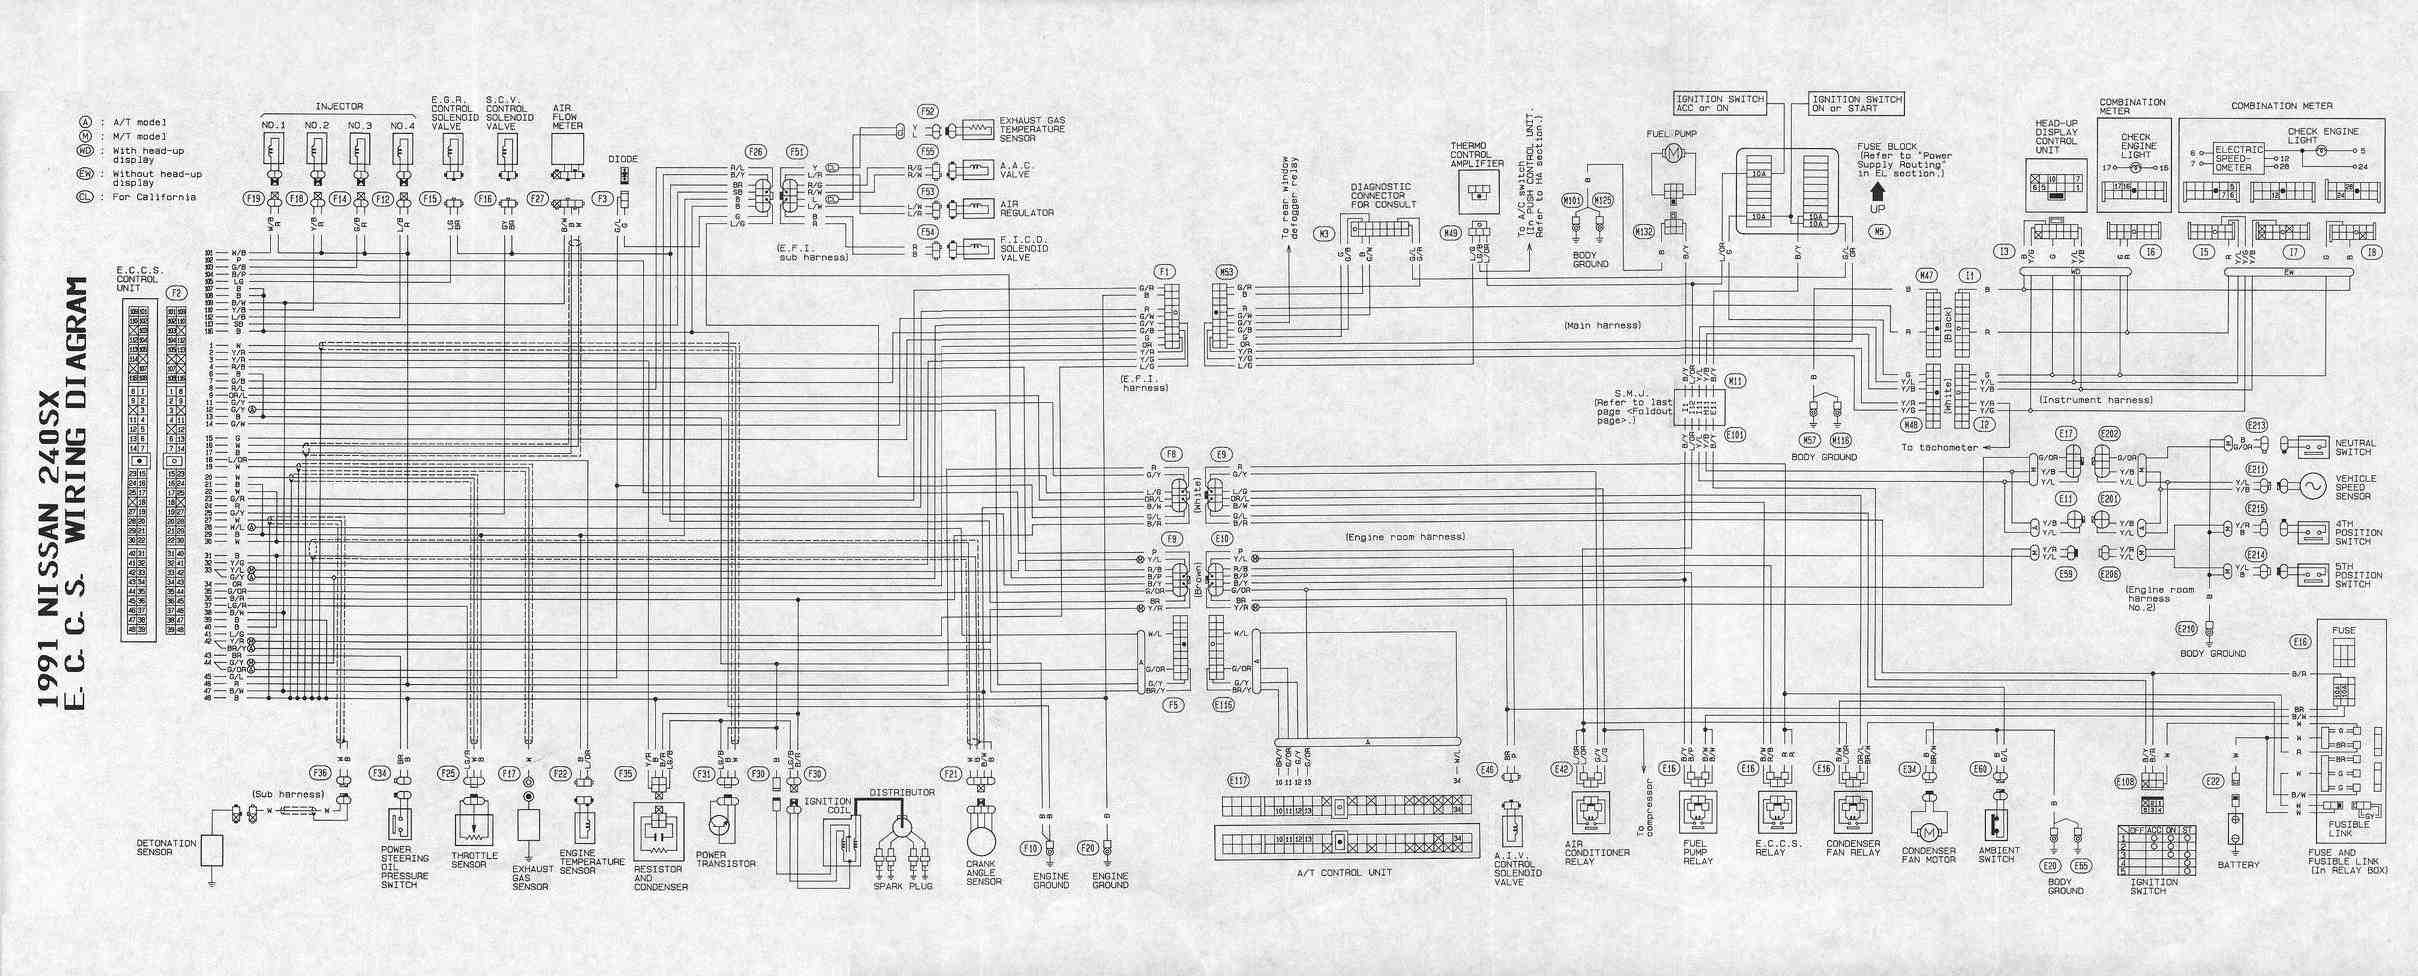 nissan juke stereo wiring diagram wiring diagram database Nissan 200Sx Wiring Diagram nissan juke radio wiring harness diagram circuit diagram template 2013 nissan juke radio wiring diagram nissan